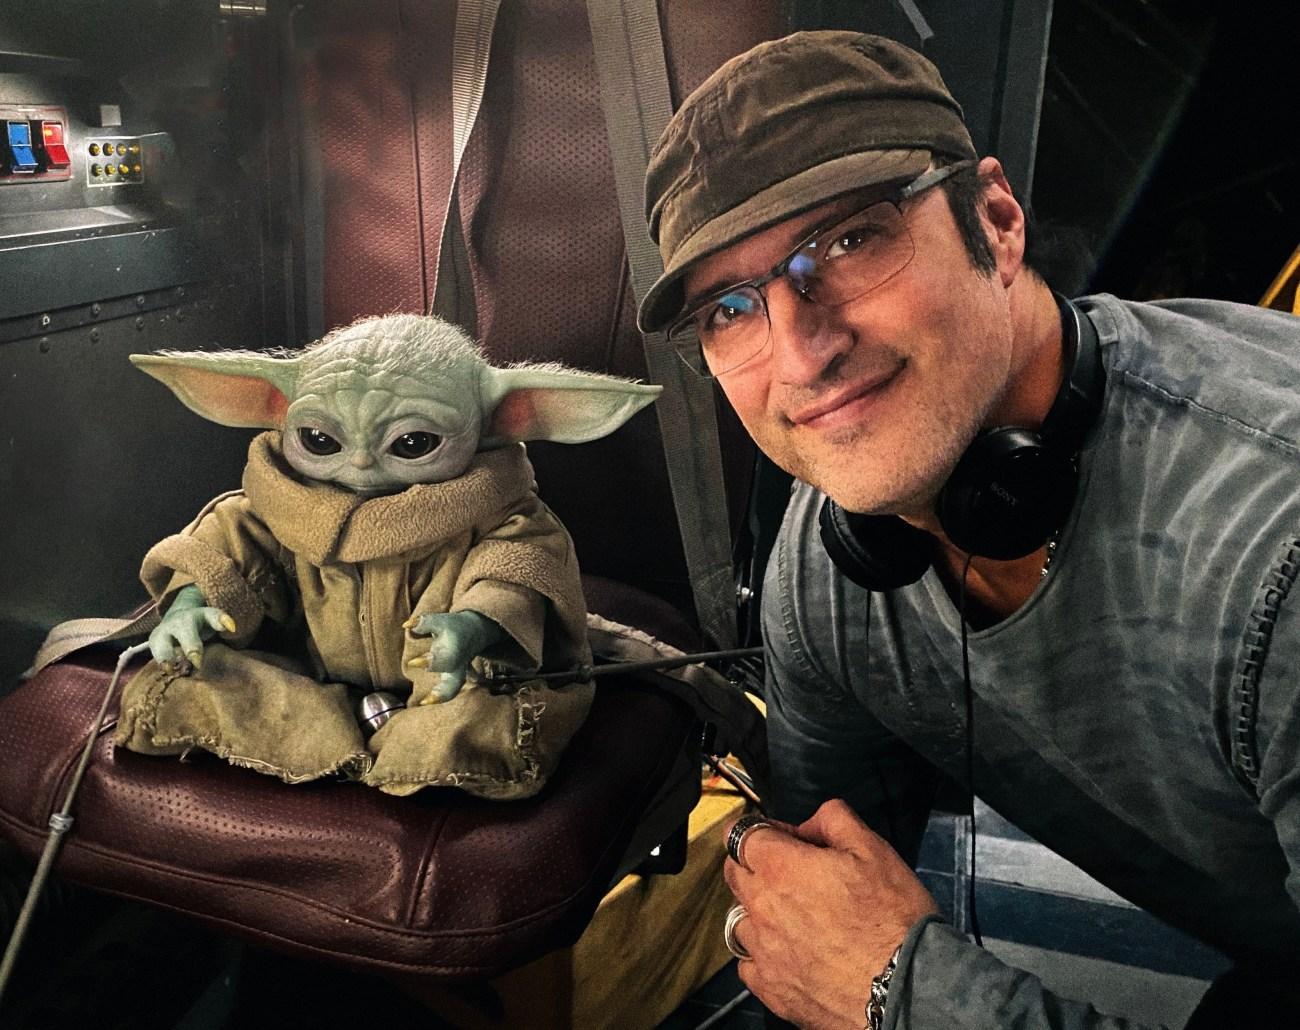 Baby Yoda y el director Robert Rodríguez en el set de The Mandalorian. Imagen: Robert Rodriguez Twitter (@Rodriguez).